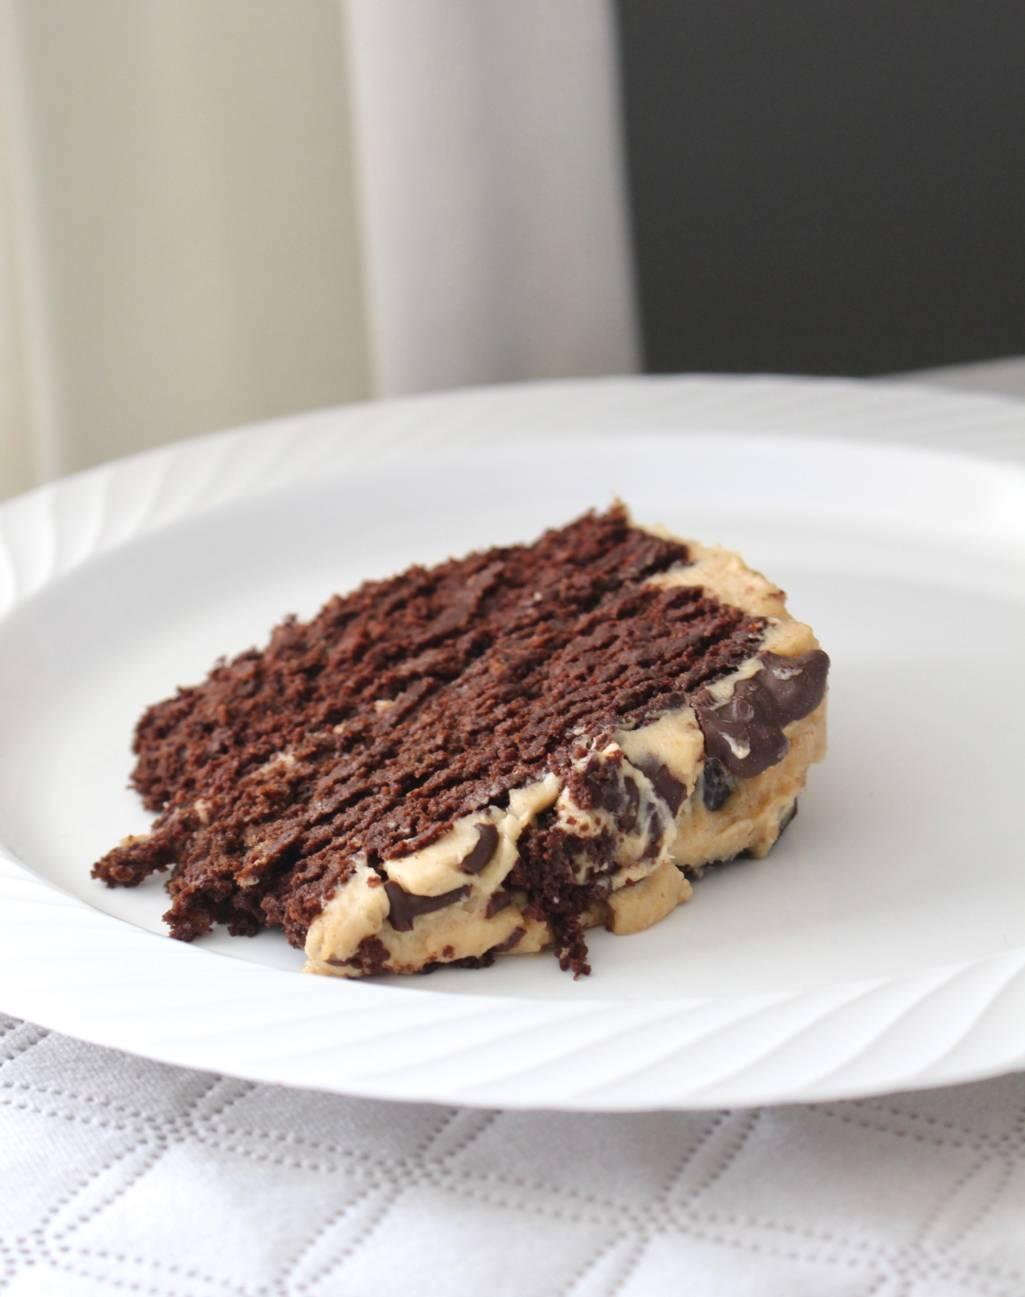 Super Moist Low-Carb Chocolate Cake (Dairy, Sugar & Gluten Free)